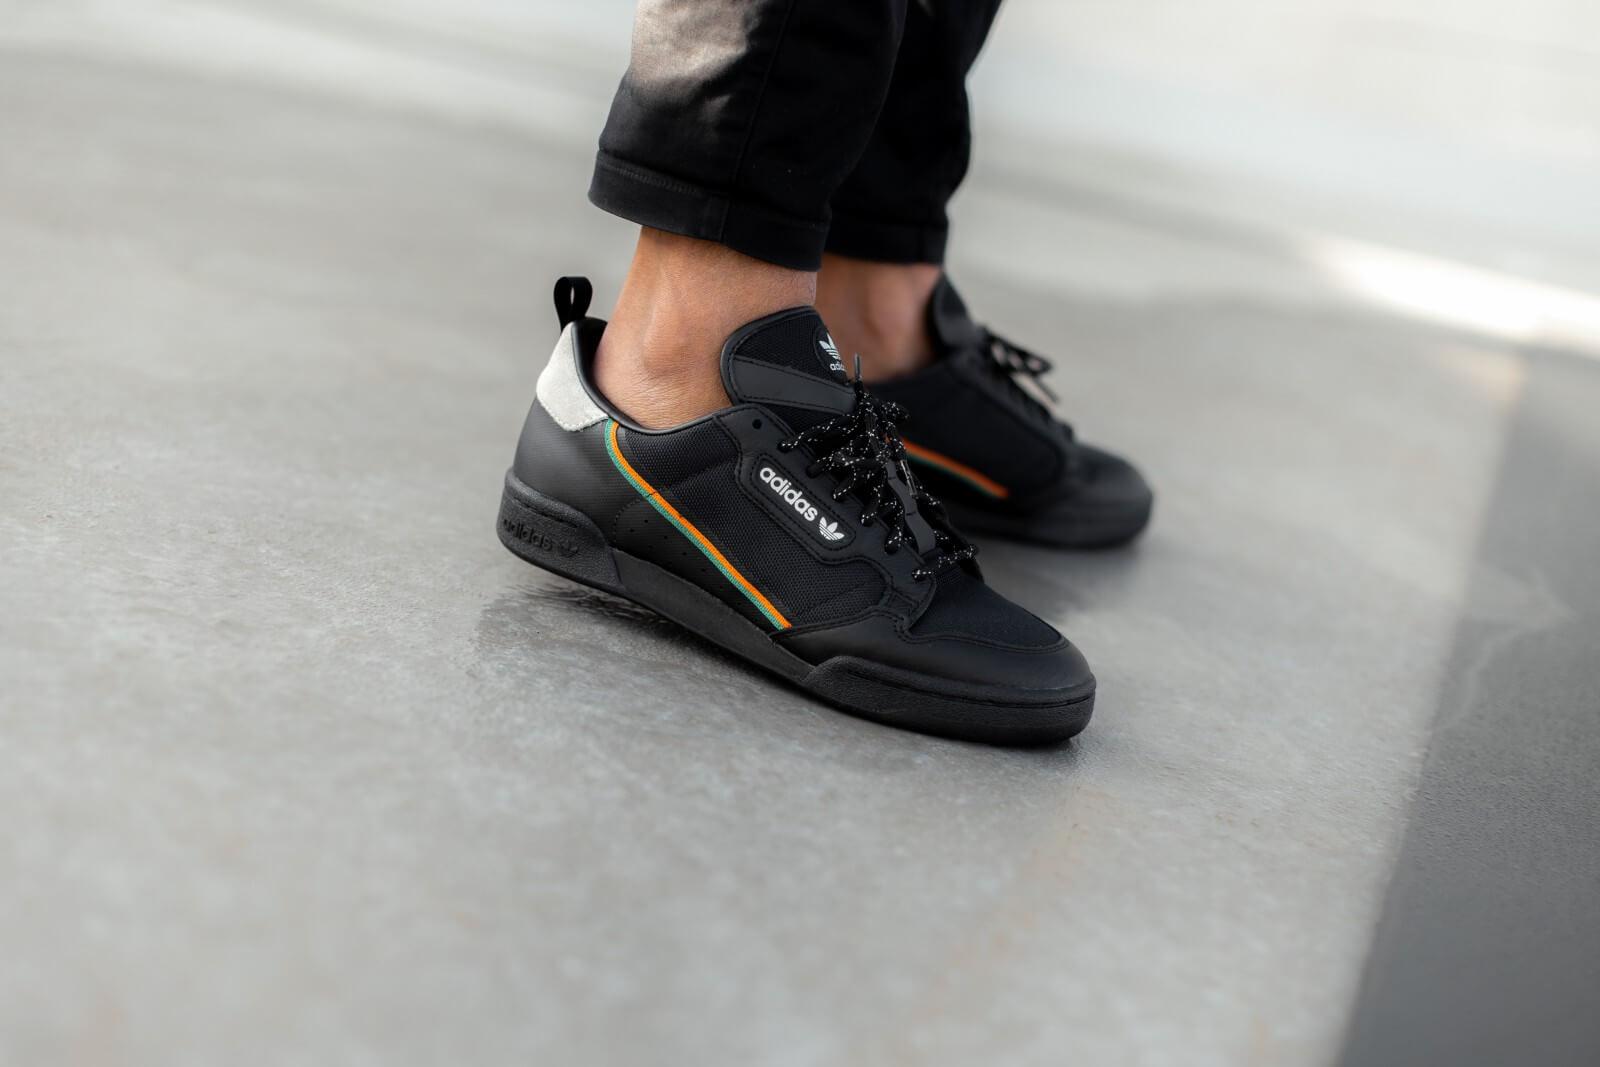 Adidas Continental 80 Core Black/Orange